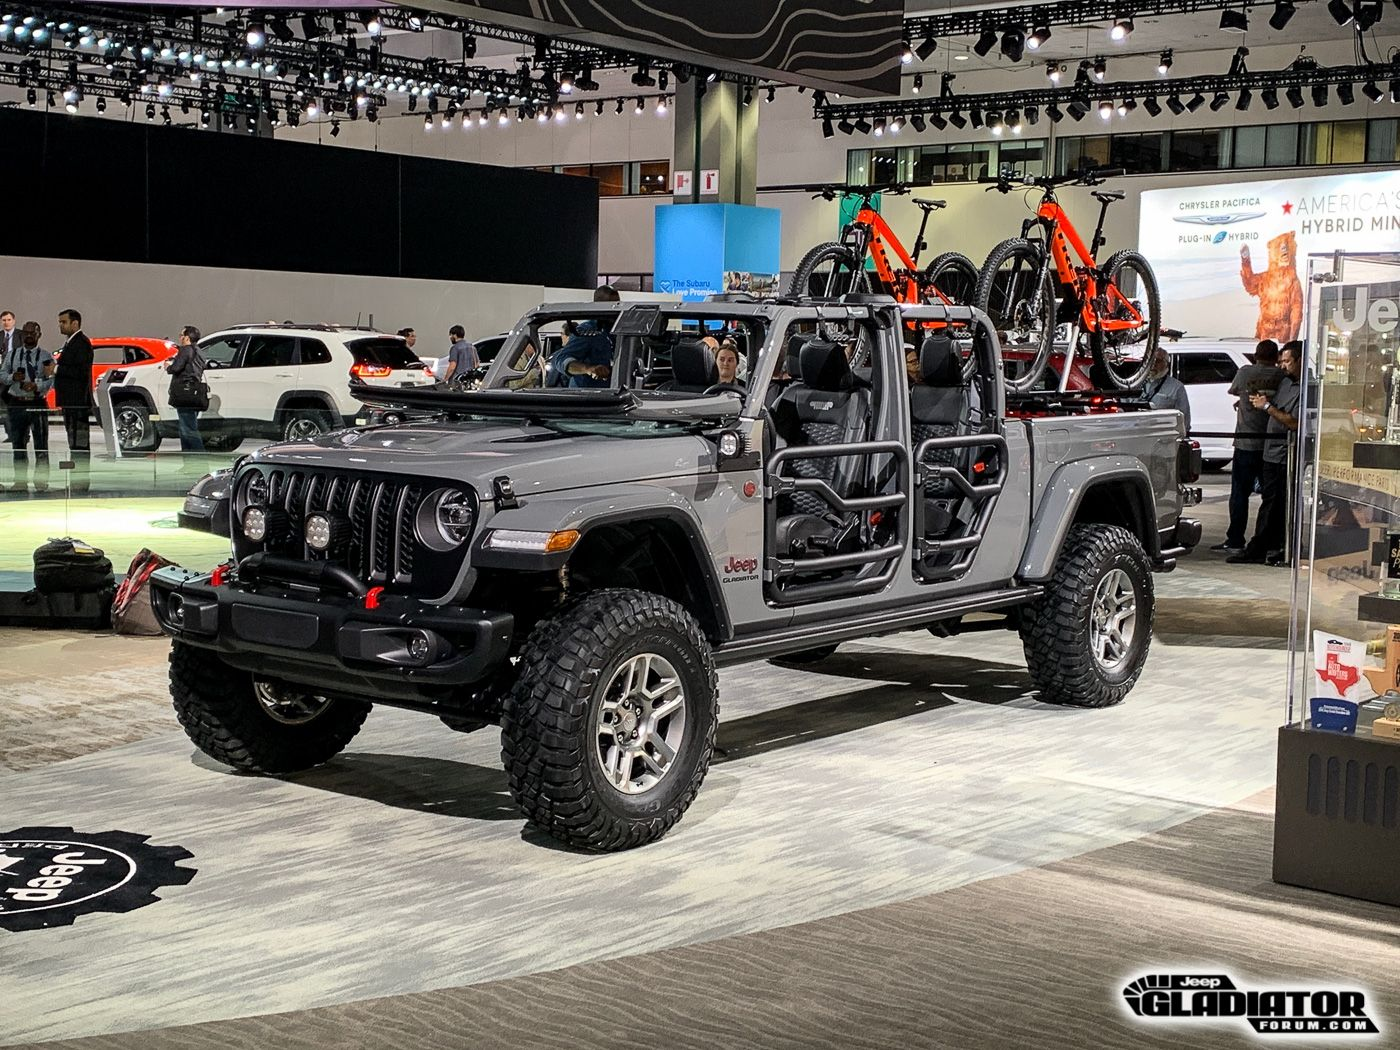 Https Www Jeepgladiatorforum Com Forum Attachments 2020 Jeep Gladiator Jt Pickup Mopar Accessories La Auto Show 9 Jpg 5983 Jeep Gladiator Gladiator Jeep Suv